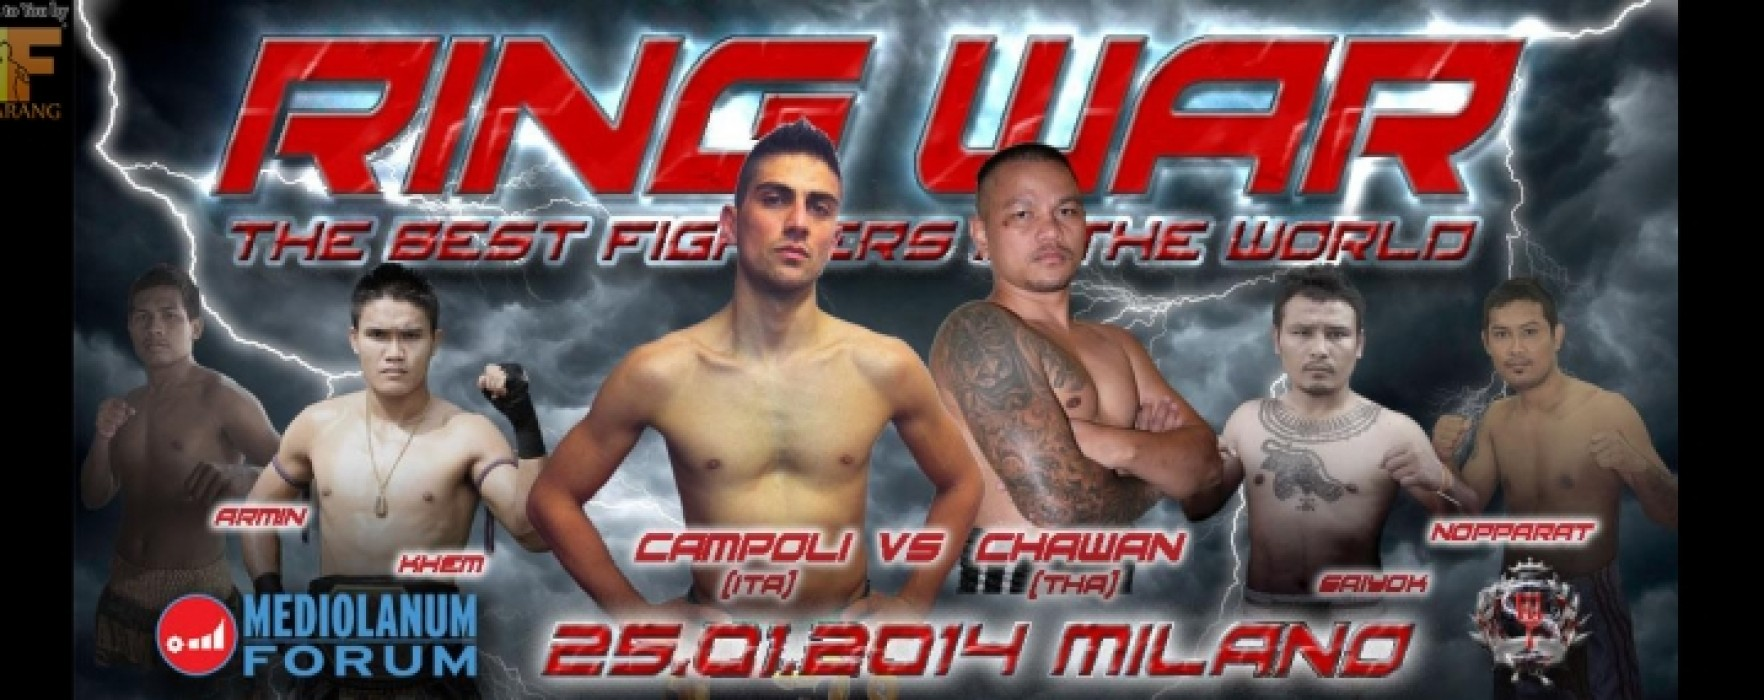 Risultati Ring Wars – Milano – 25-01-2014